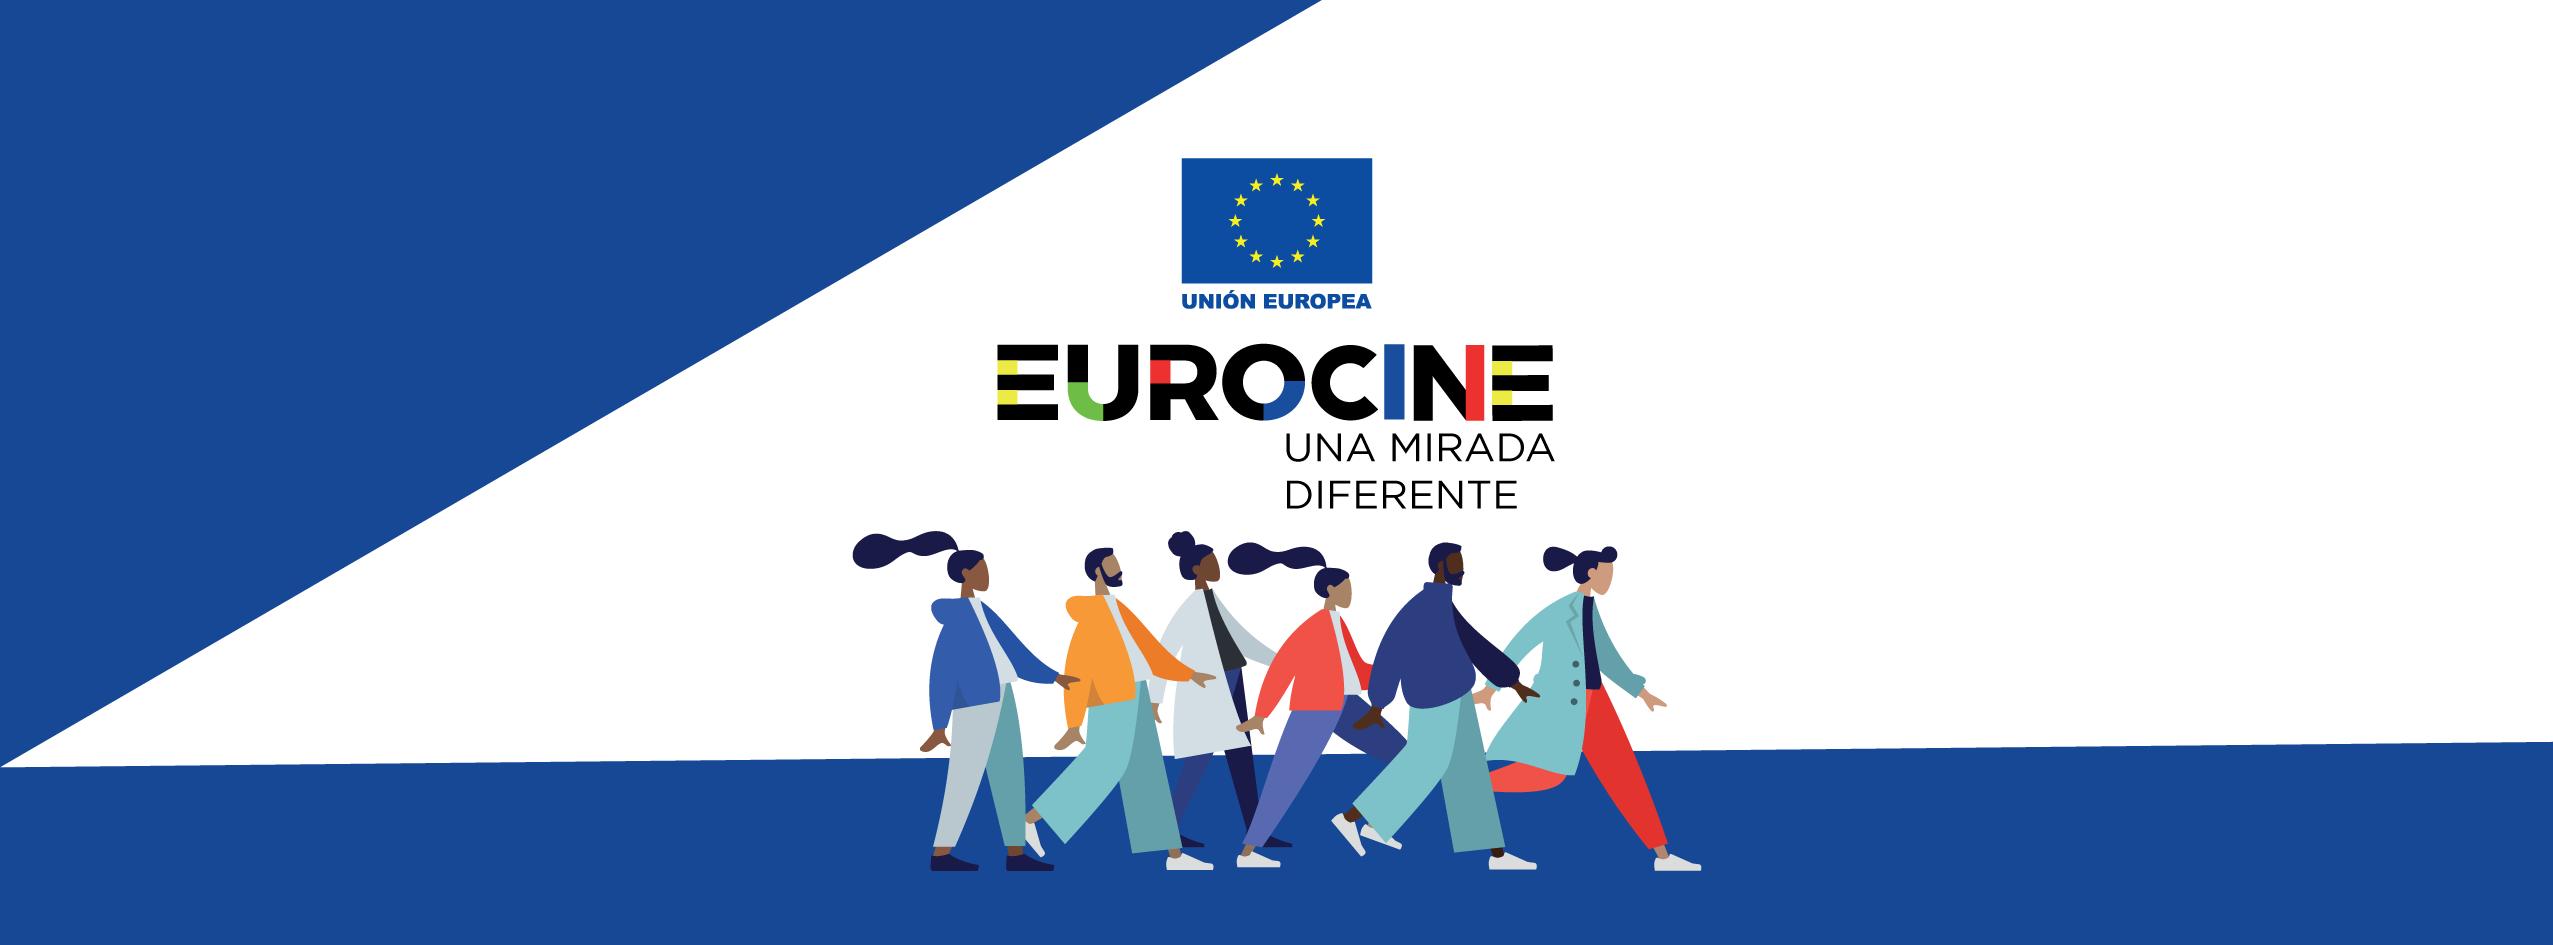 (Foto: Eurocine, Una Mirada Diferente)